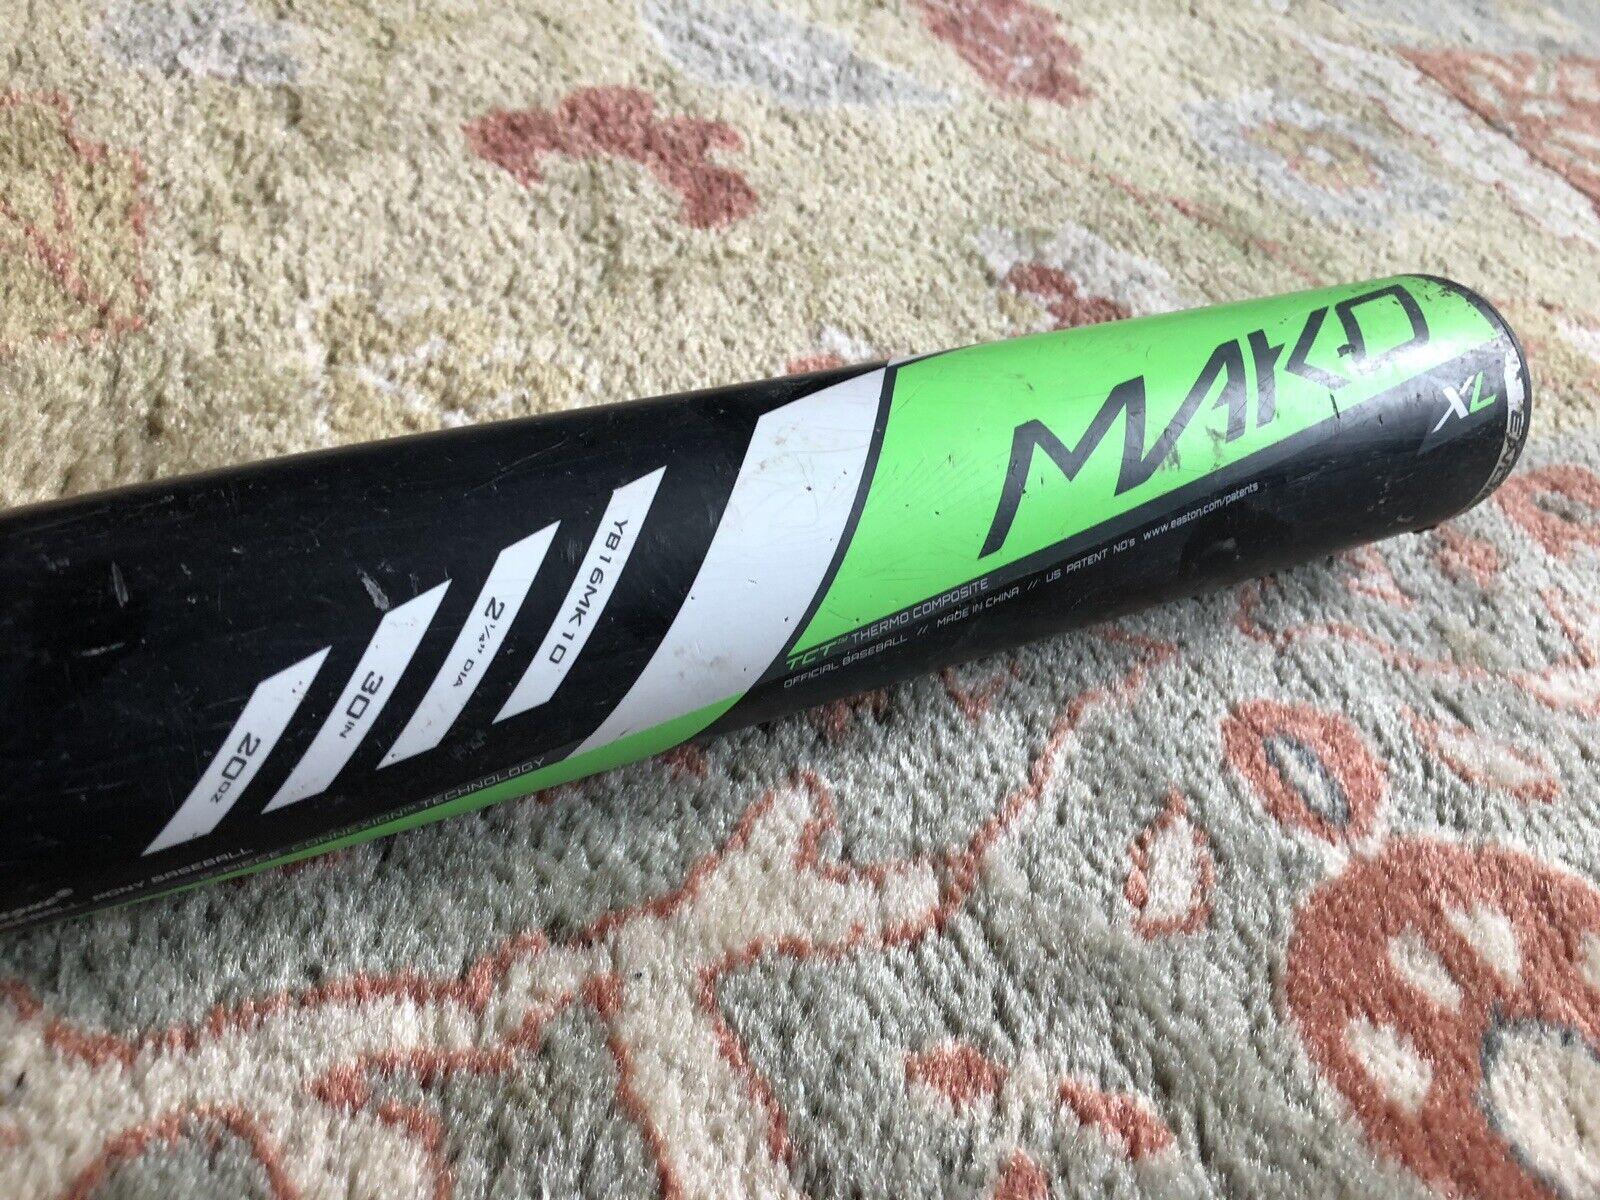 Easton Mako Xl YB16MK10 30 20 usssa bate de béisbol Excelente Estado